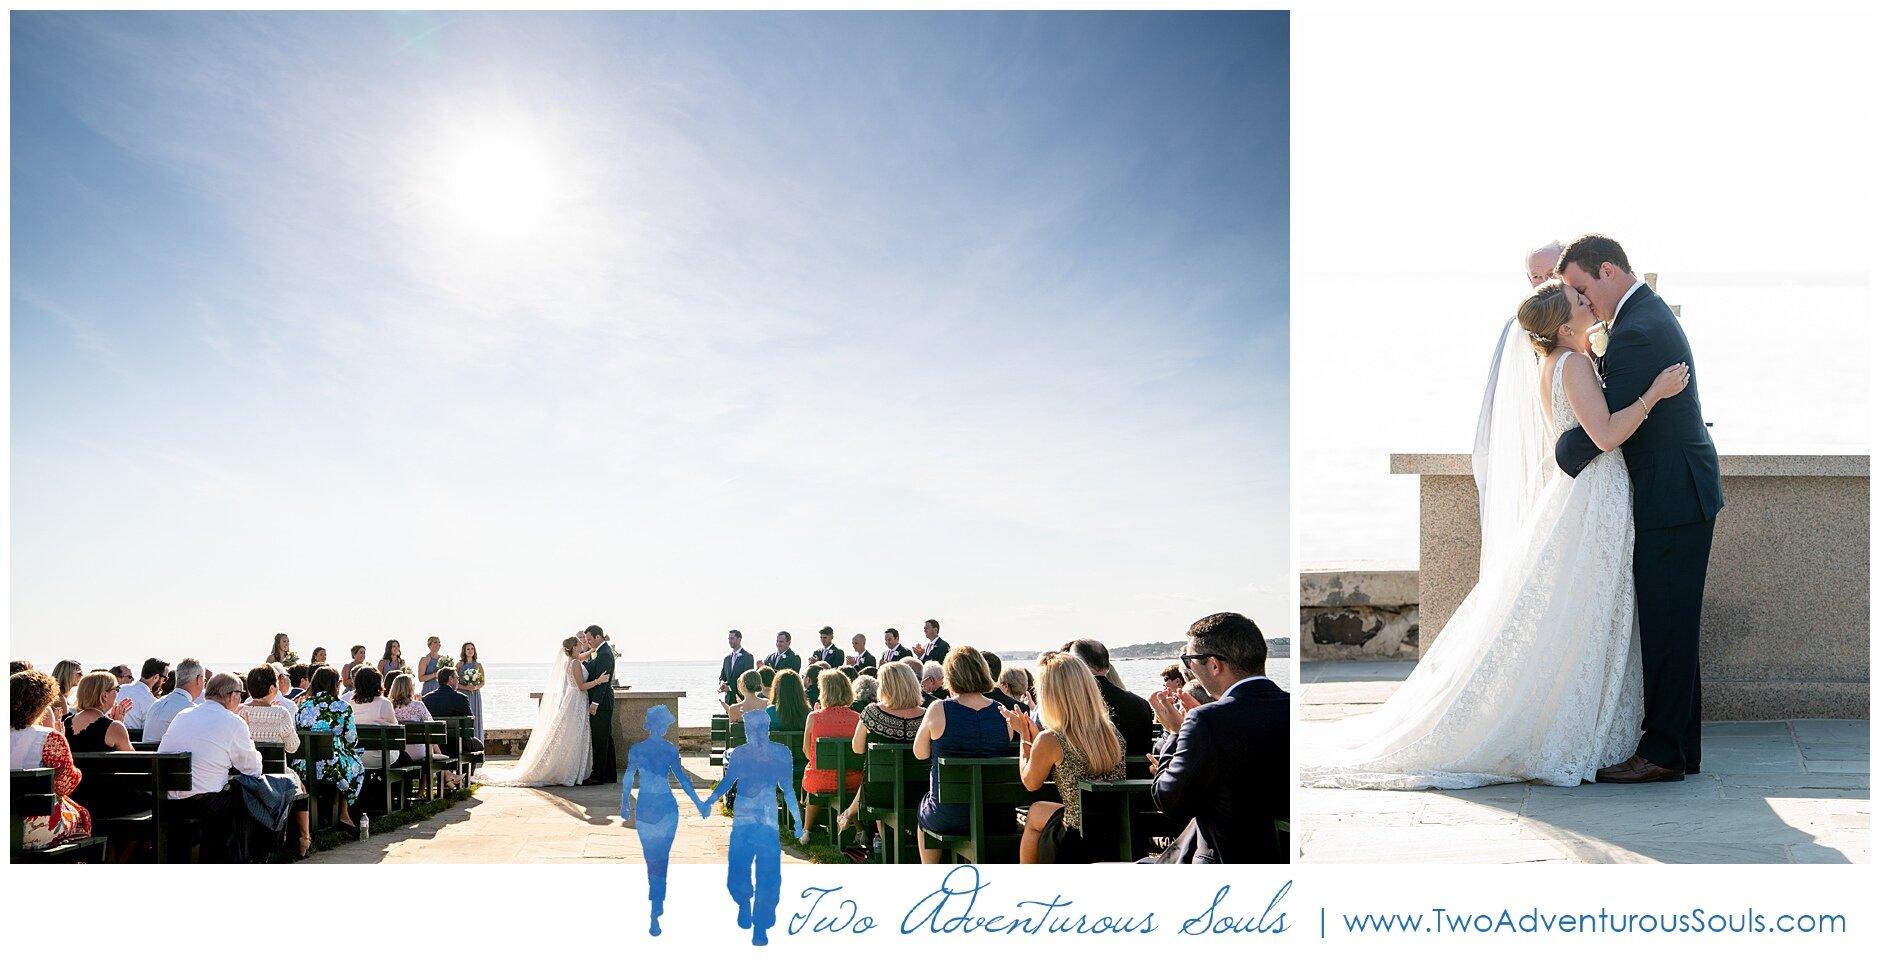 Breakwater Inn and Spa Wedding Photographers, Kennebunkport Wedding Photographers, Two Adventurous Souls- 092119_0035.jpg